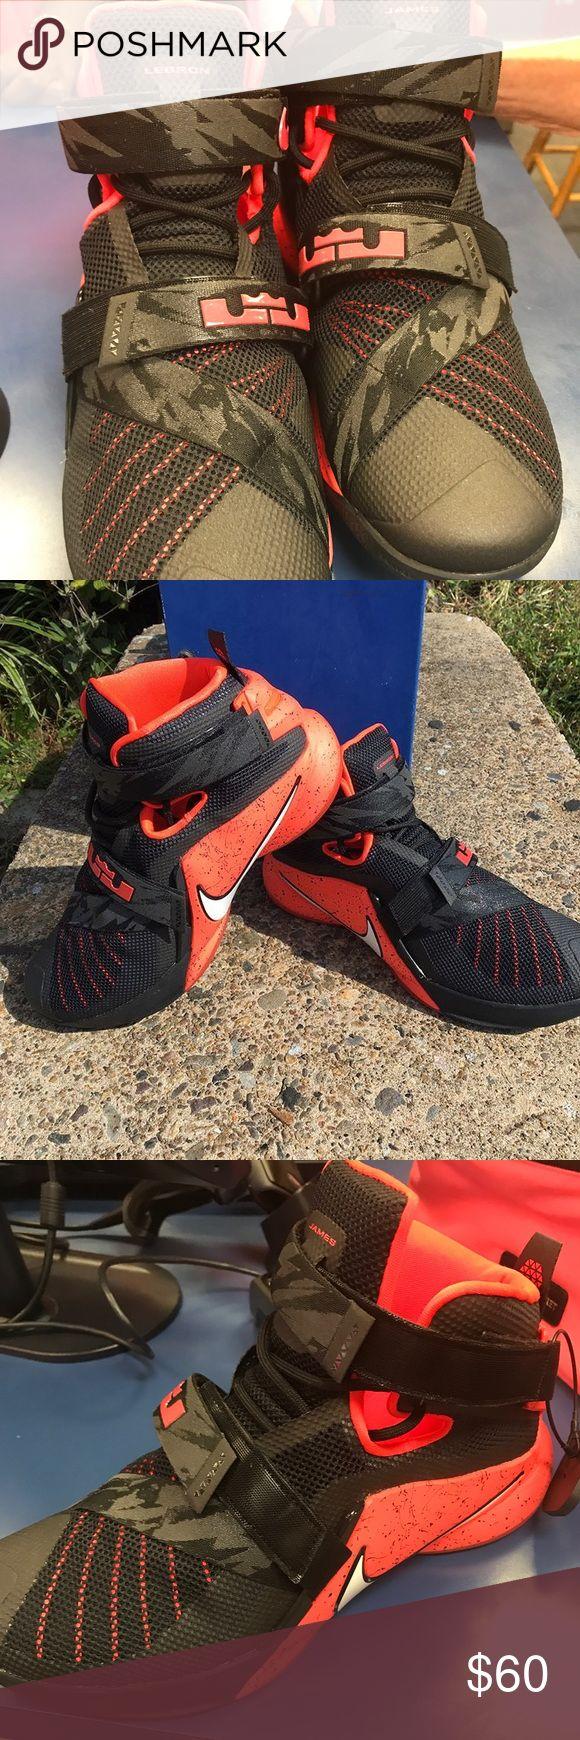 Mens lebron James sneakers Excellent condition size 10 lebron james Shoes Sneakers